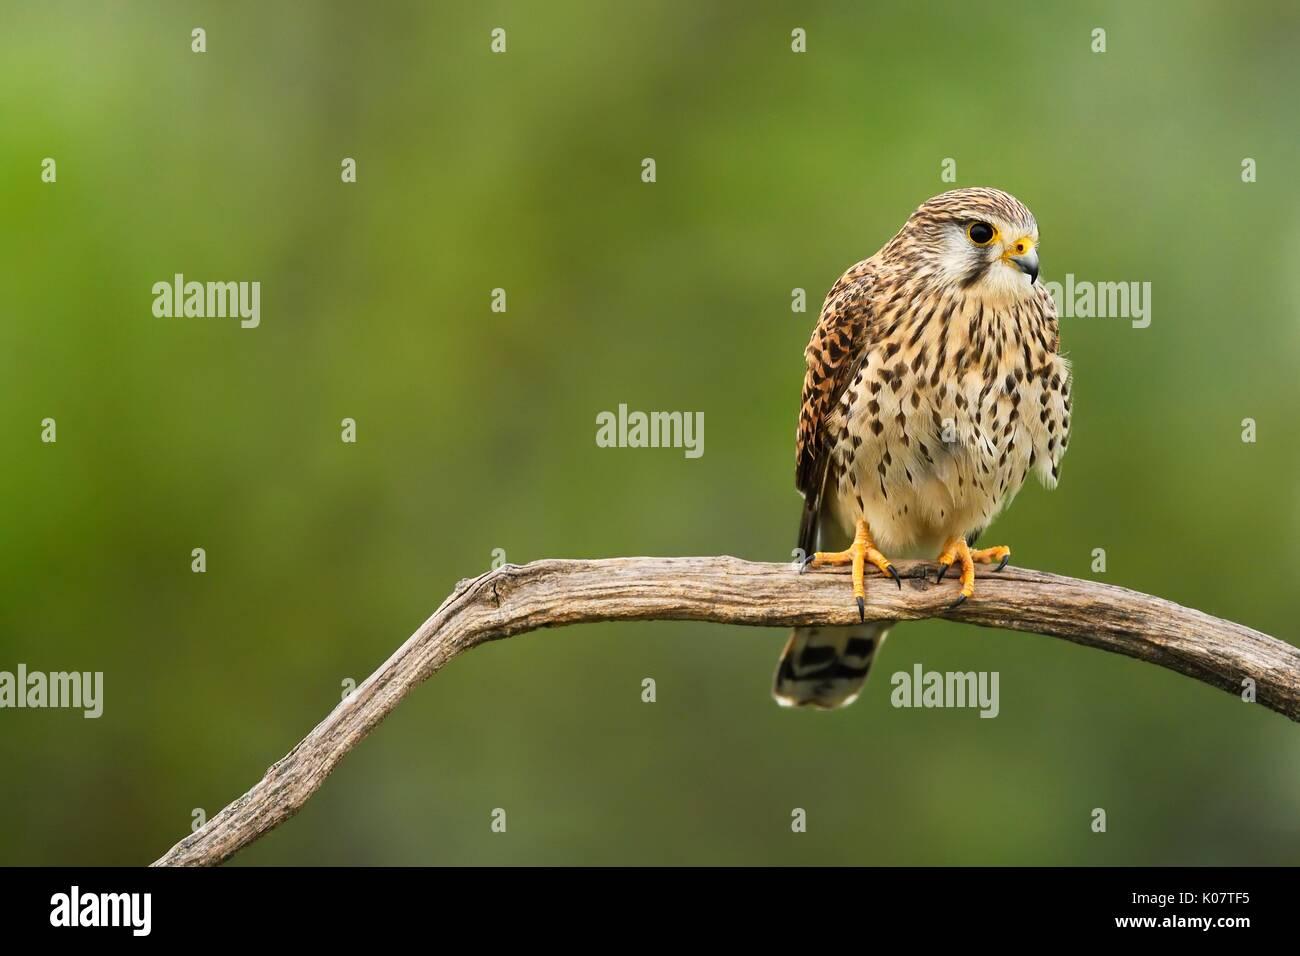 Common kestrel (Falco tinnunculus), female sitting on branch, Kiskunság National Park, Hungary - Stock Image